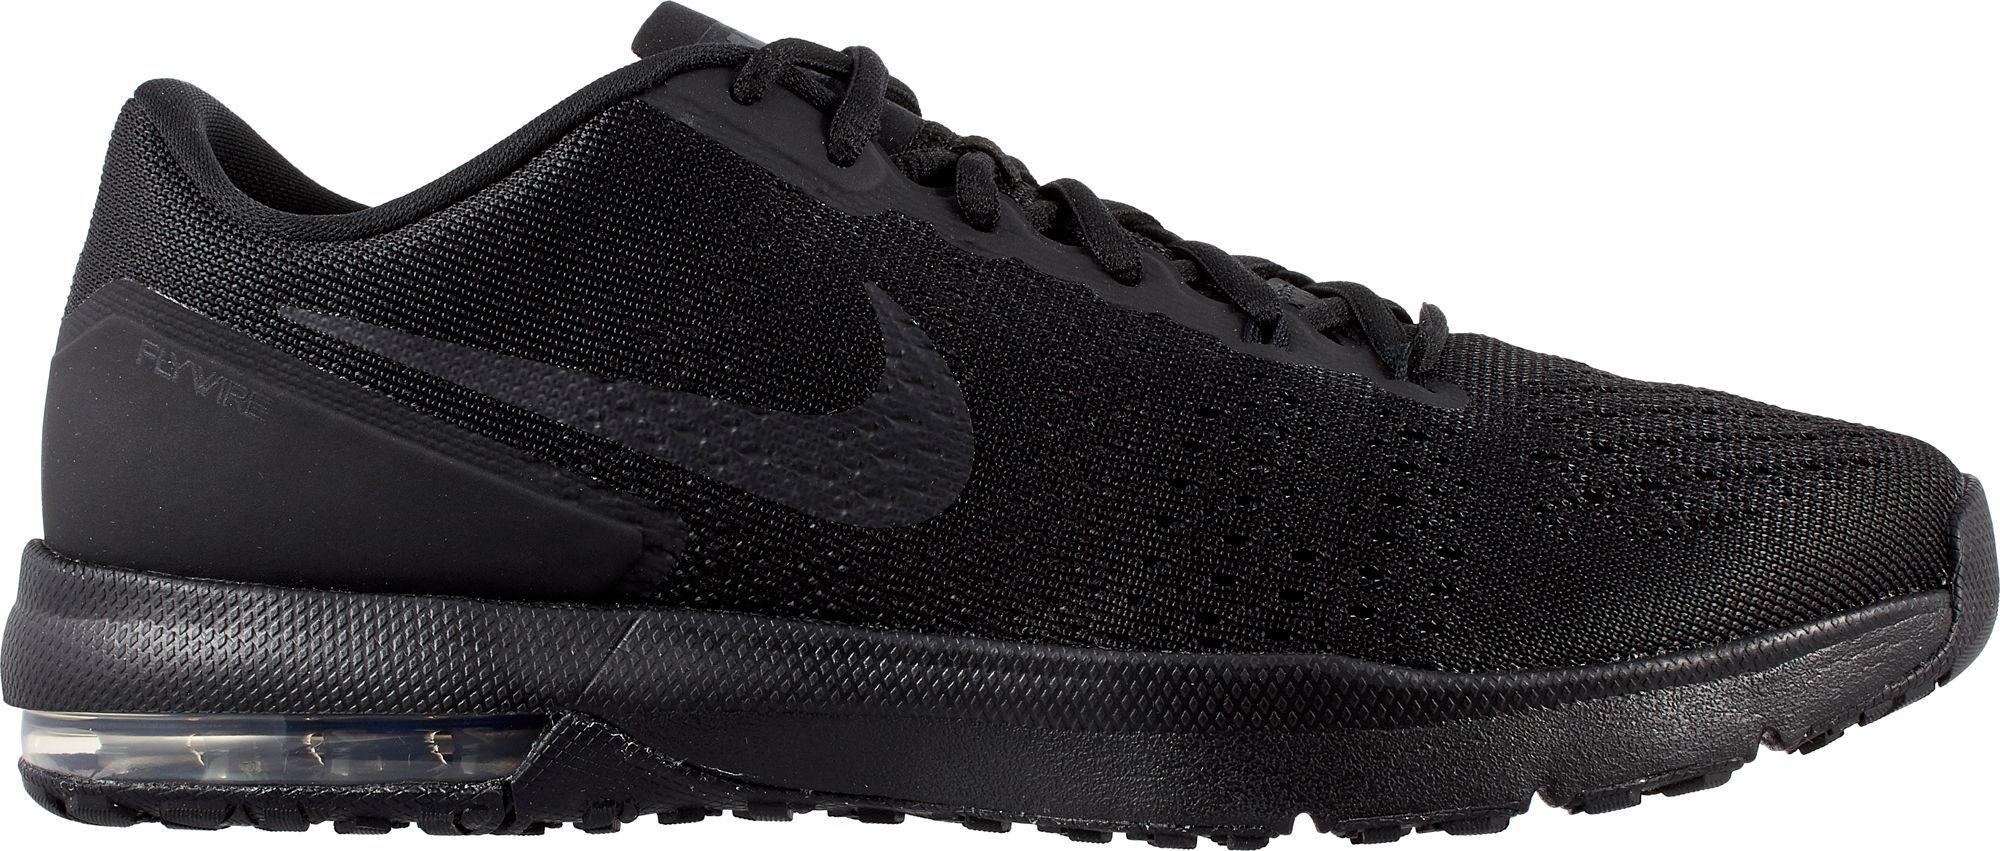 b90d74740e54 Nike Men s Air Max Typha Training Shoes